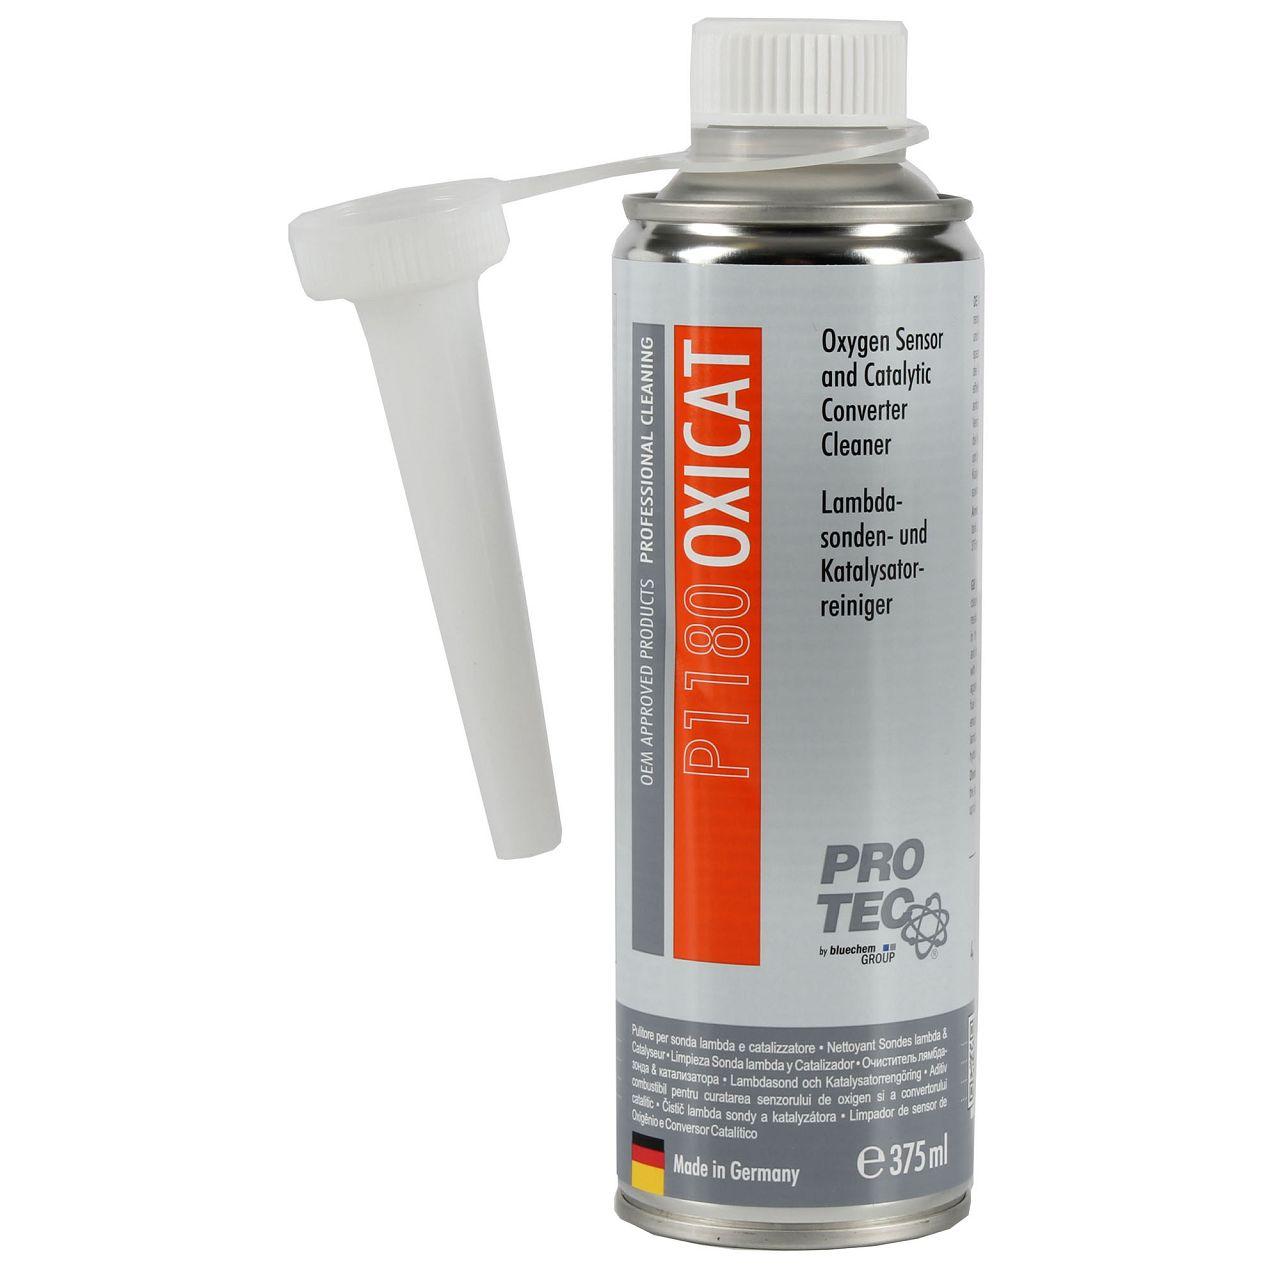 PROTEC P1180 OXICAT Lambdasondenreiniger + Katalysatorreiniger 375ml